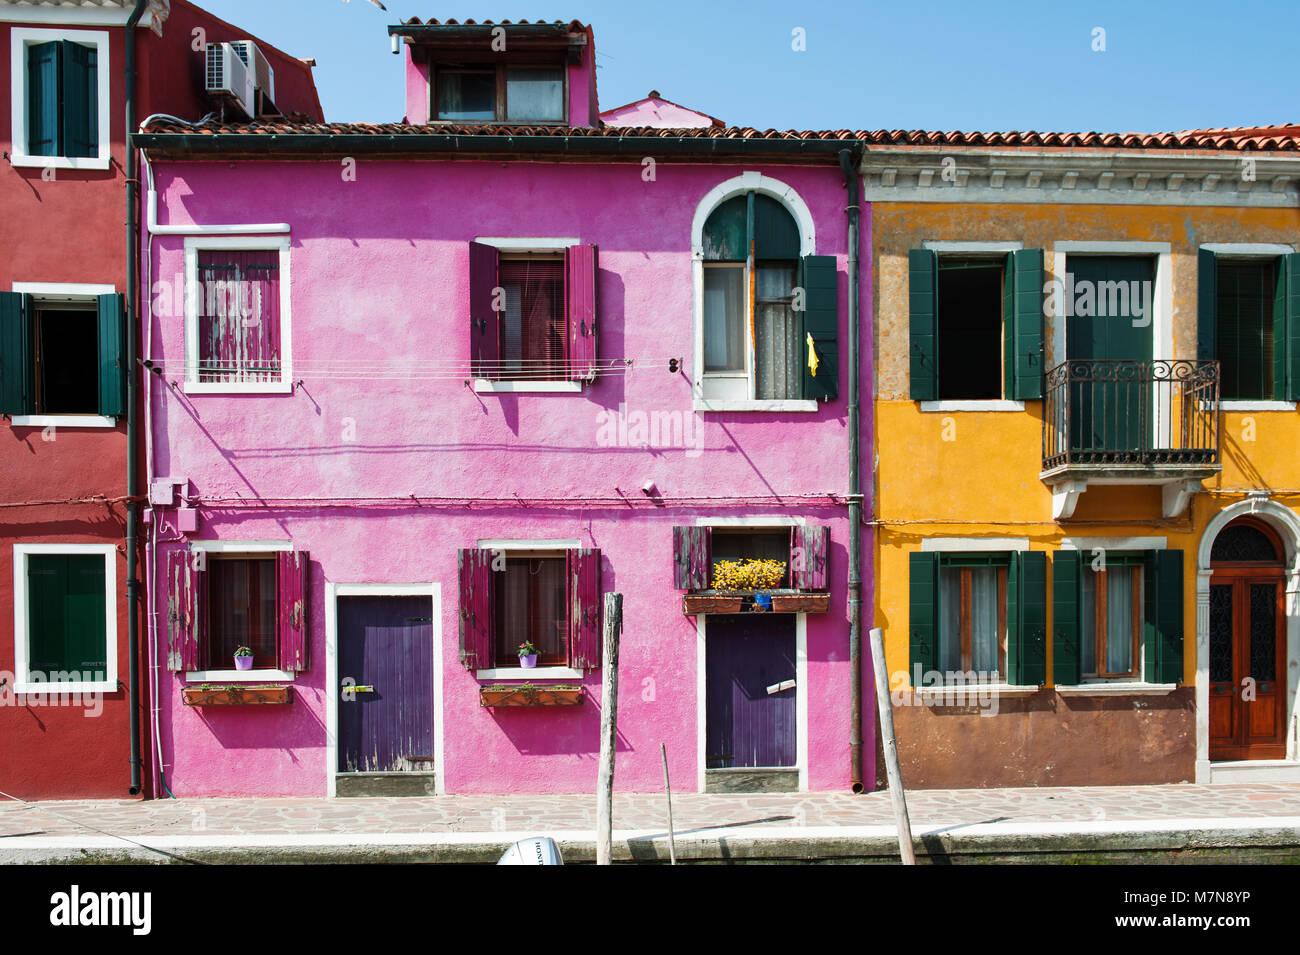 Bunte Häuser in Insel Burano, Venedig, Italien, Europa Stockbild